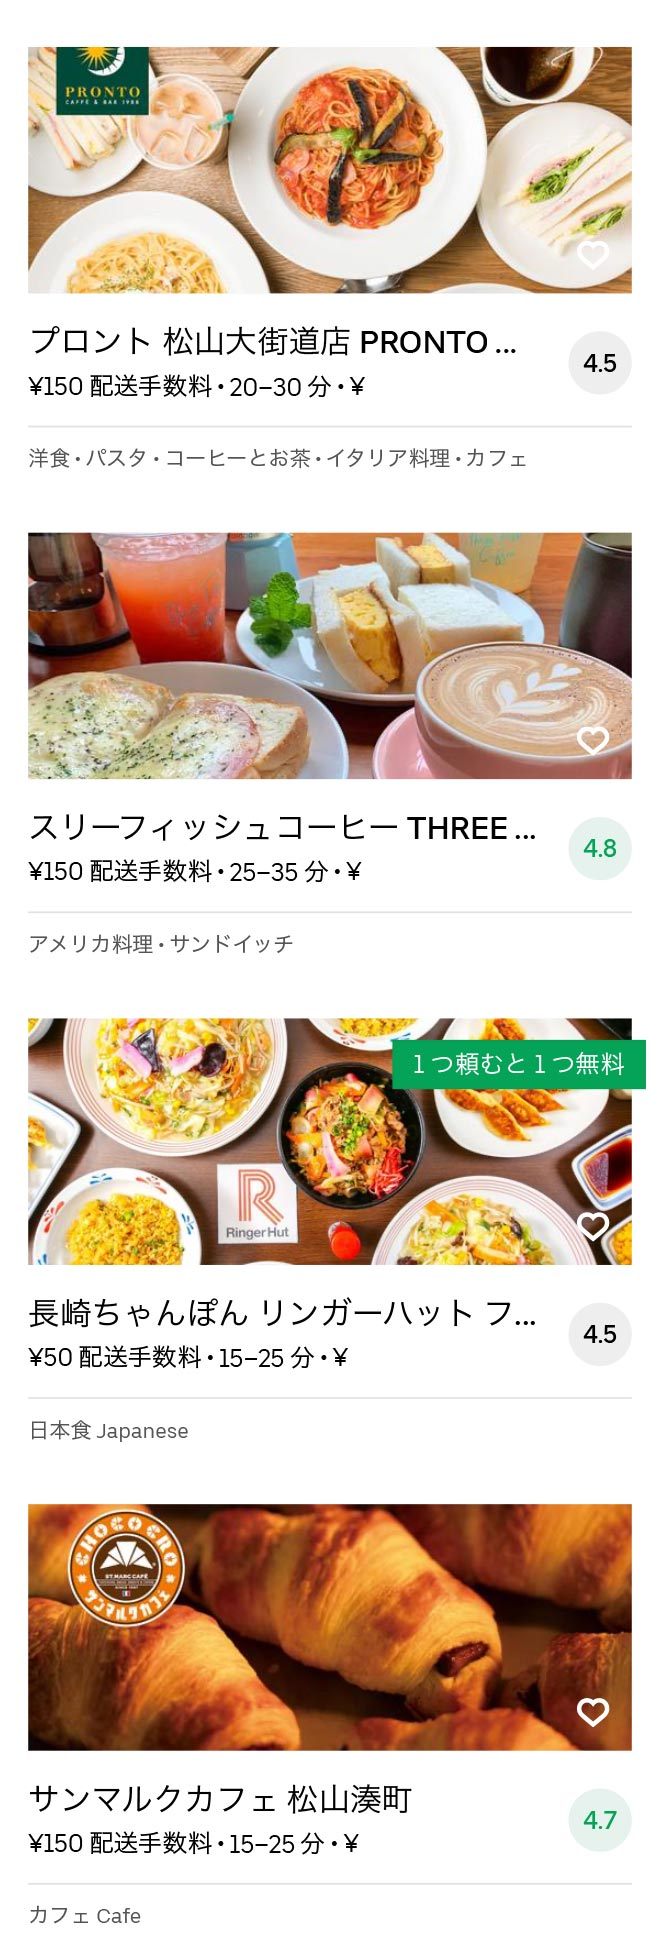 Matsuyama menu 2010 11